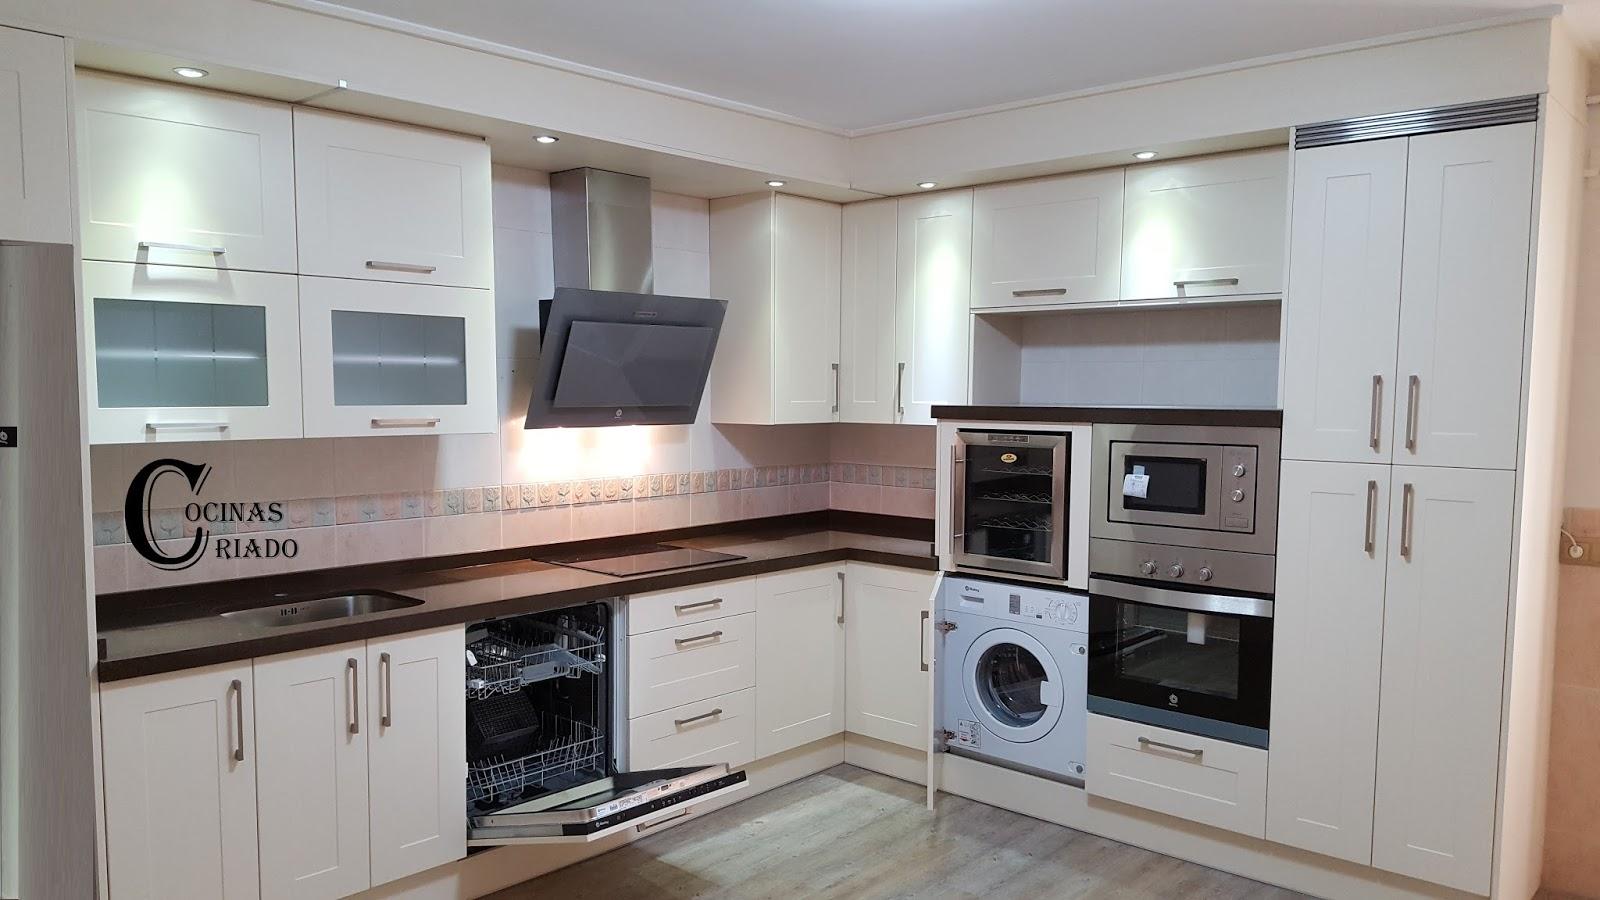 Cocinas criado roncal beige for Cocinas completas con electrodomesticos